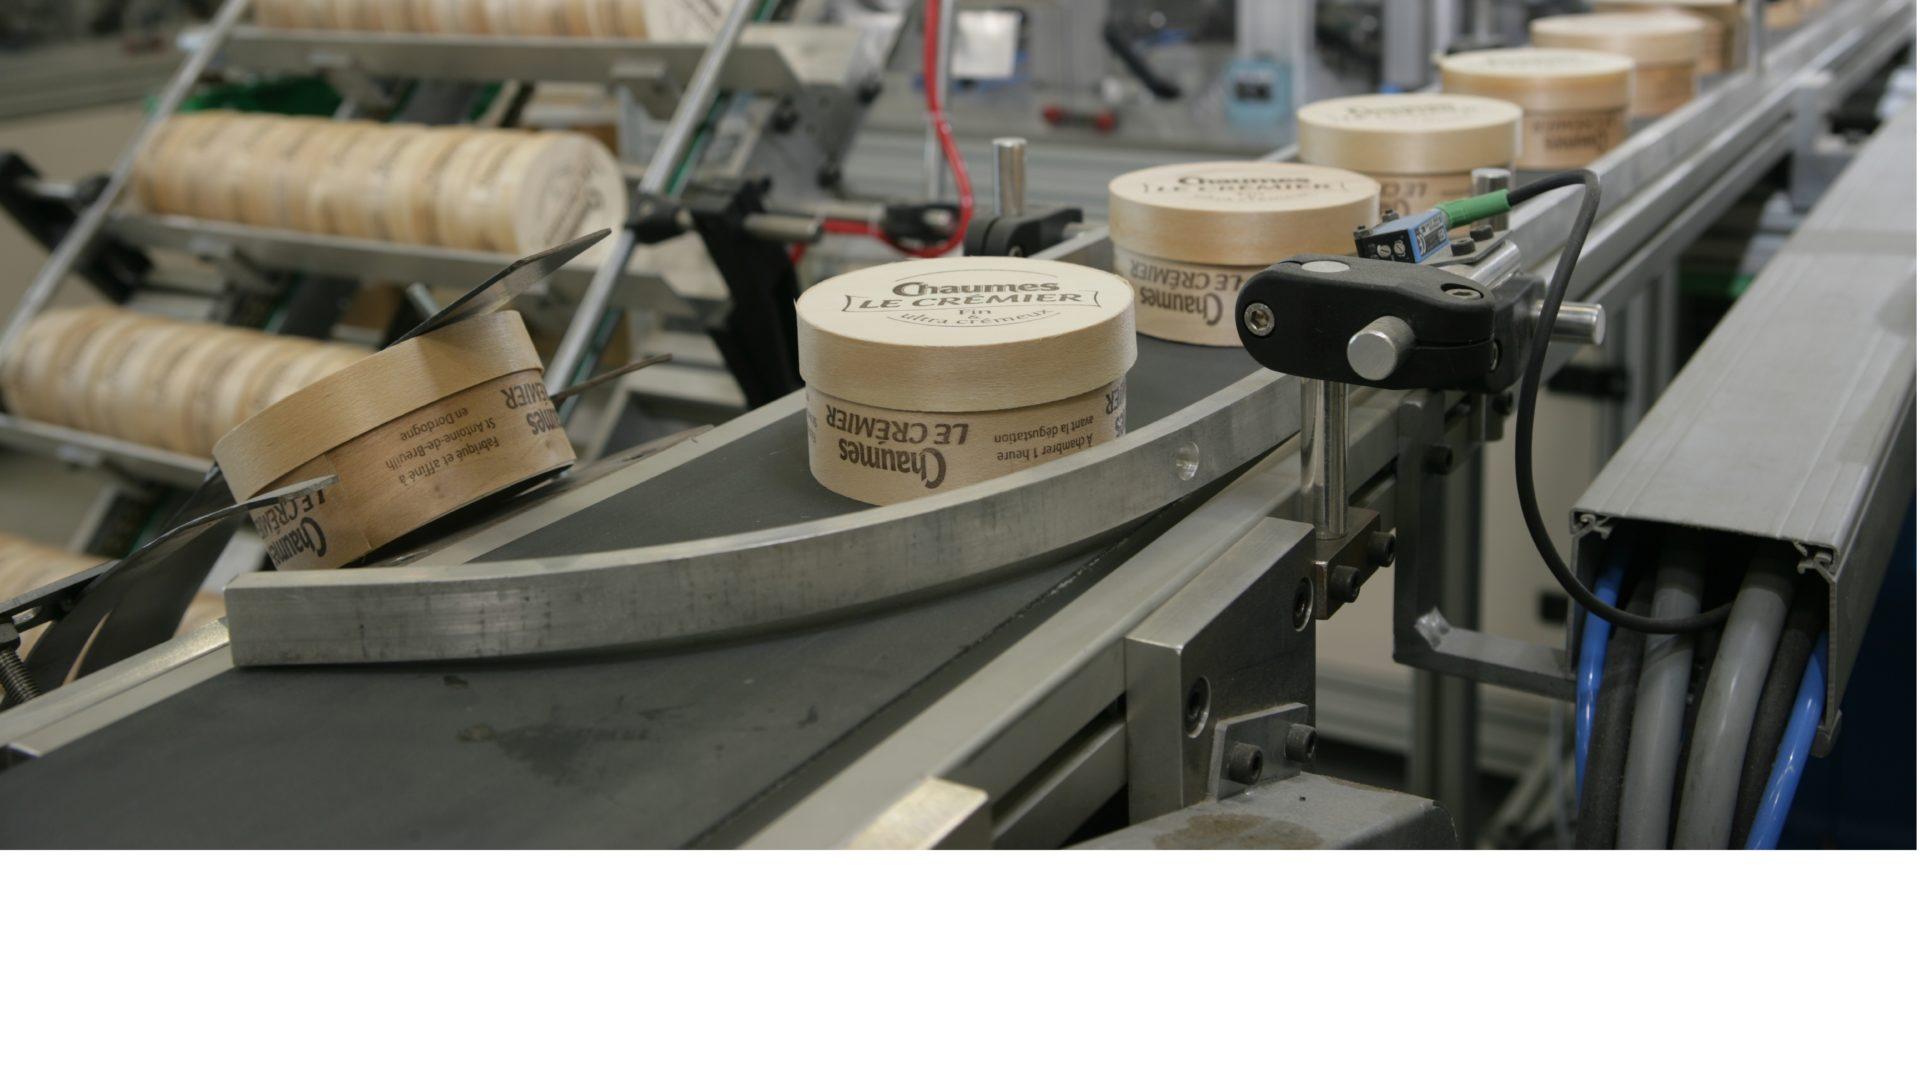 fabricant d emballages alimentaires en bois carton plastique. Black Bedroom Furniture Sets. Home Design Ideas